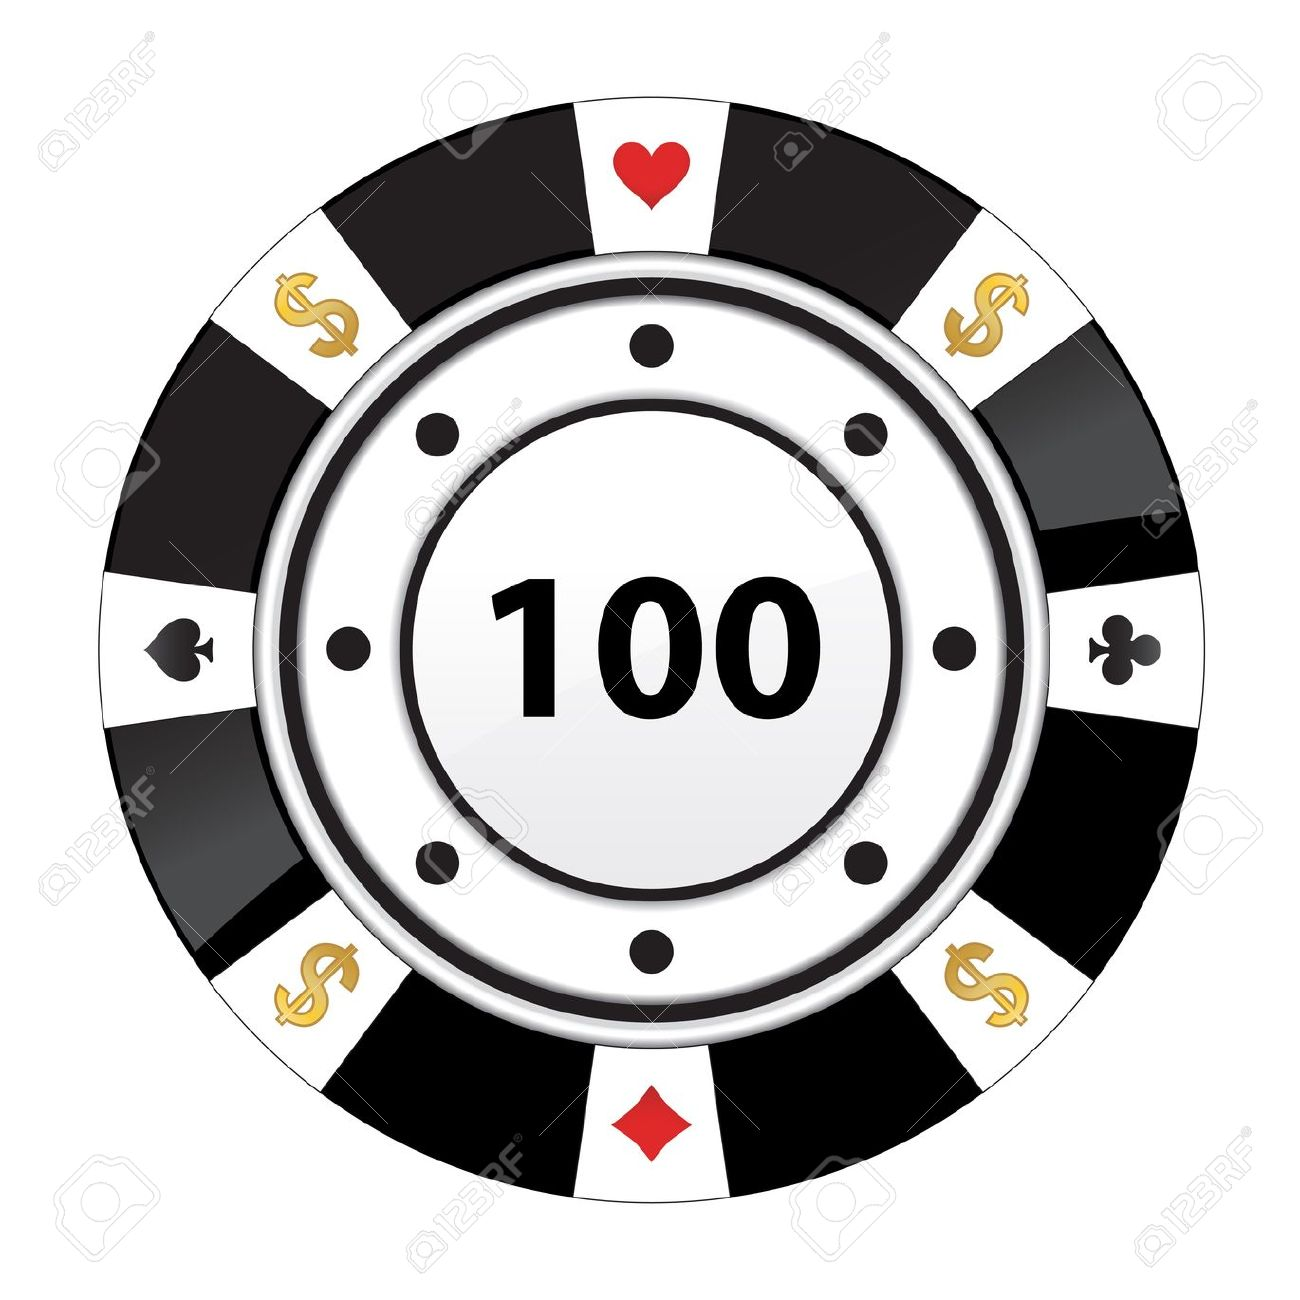 Poker Chips Clipart Black And White Clip-Poker chips clipart black and white ClipartFest-13